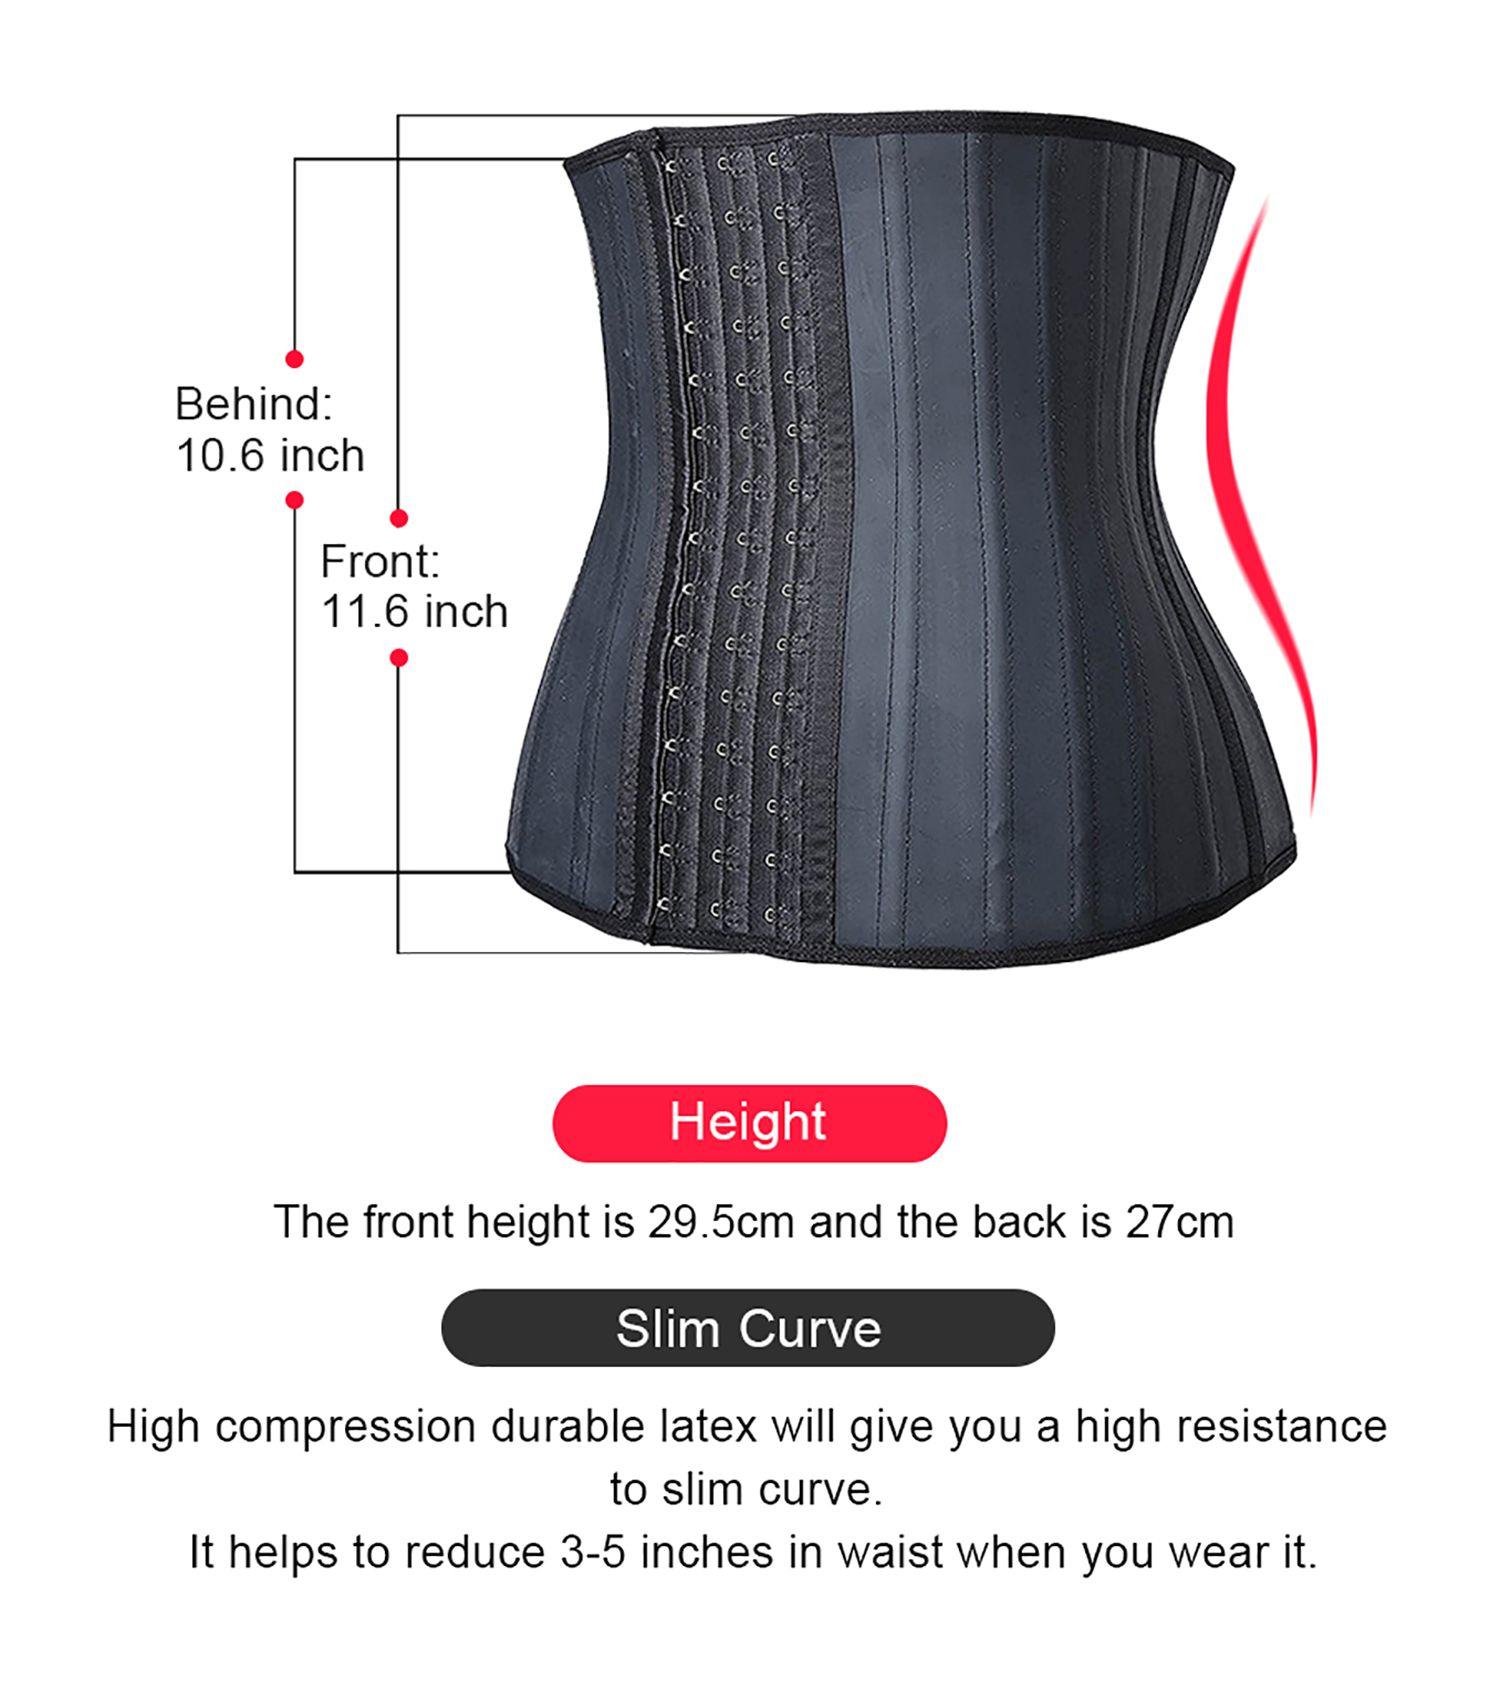 eaa22f46086a0 Camellias Women Classic 3 Hooks Latex Waist Trainer Corset For Weight Loss  Waist Cincher Body Shaper Slimmer Tummy Control Shapewear Black